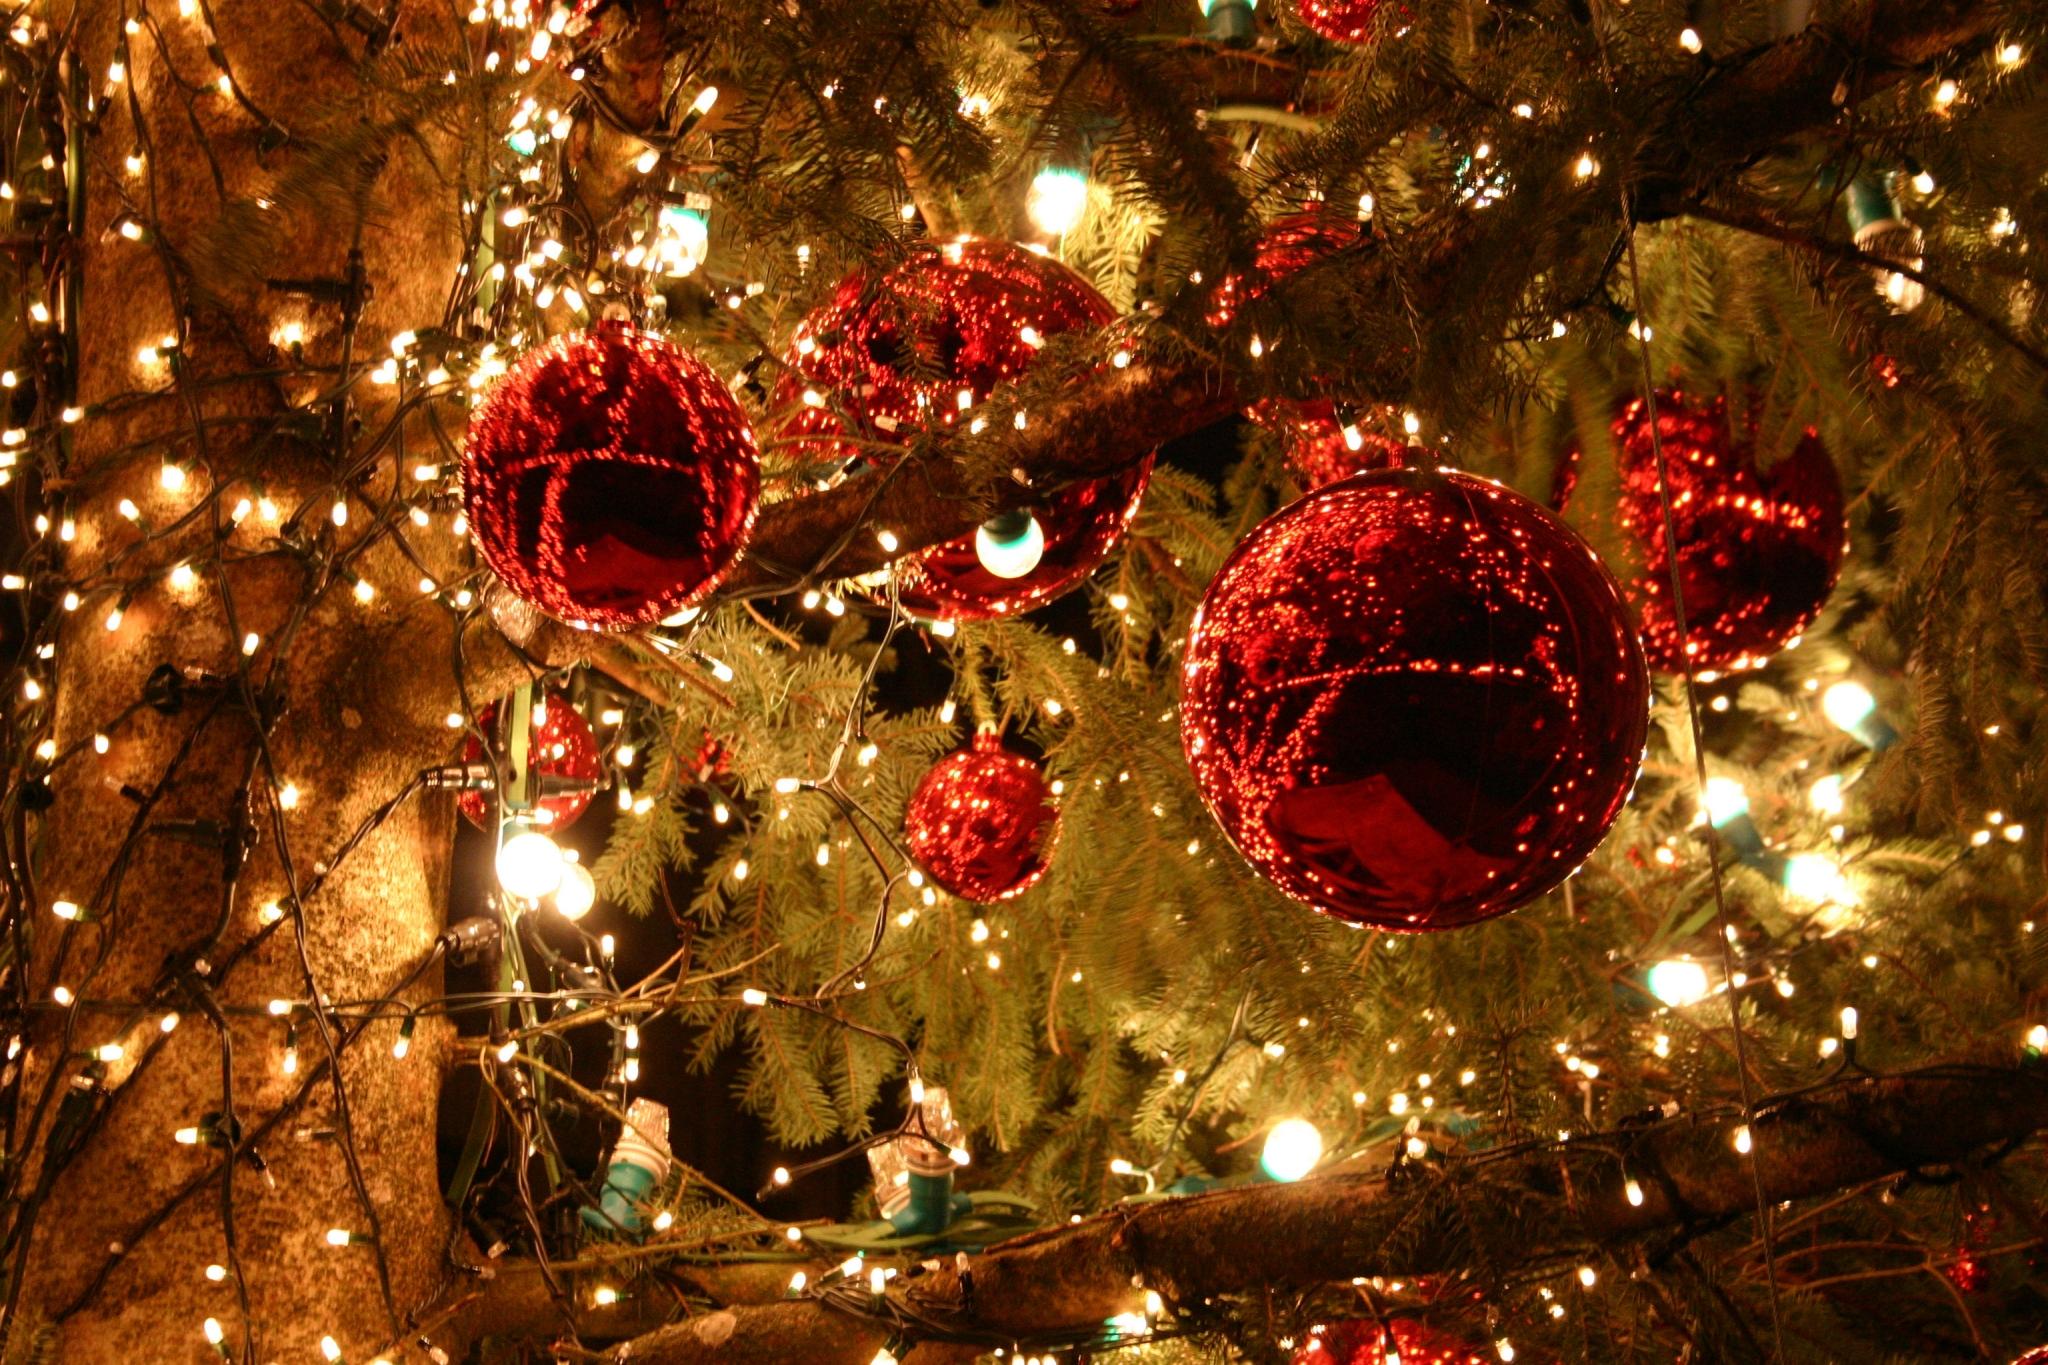 Vrolijk kerstfeest! (christmas tag)